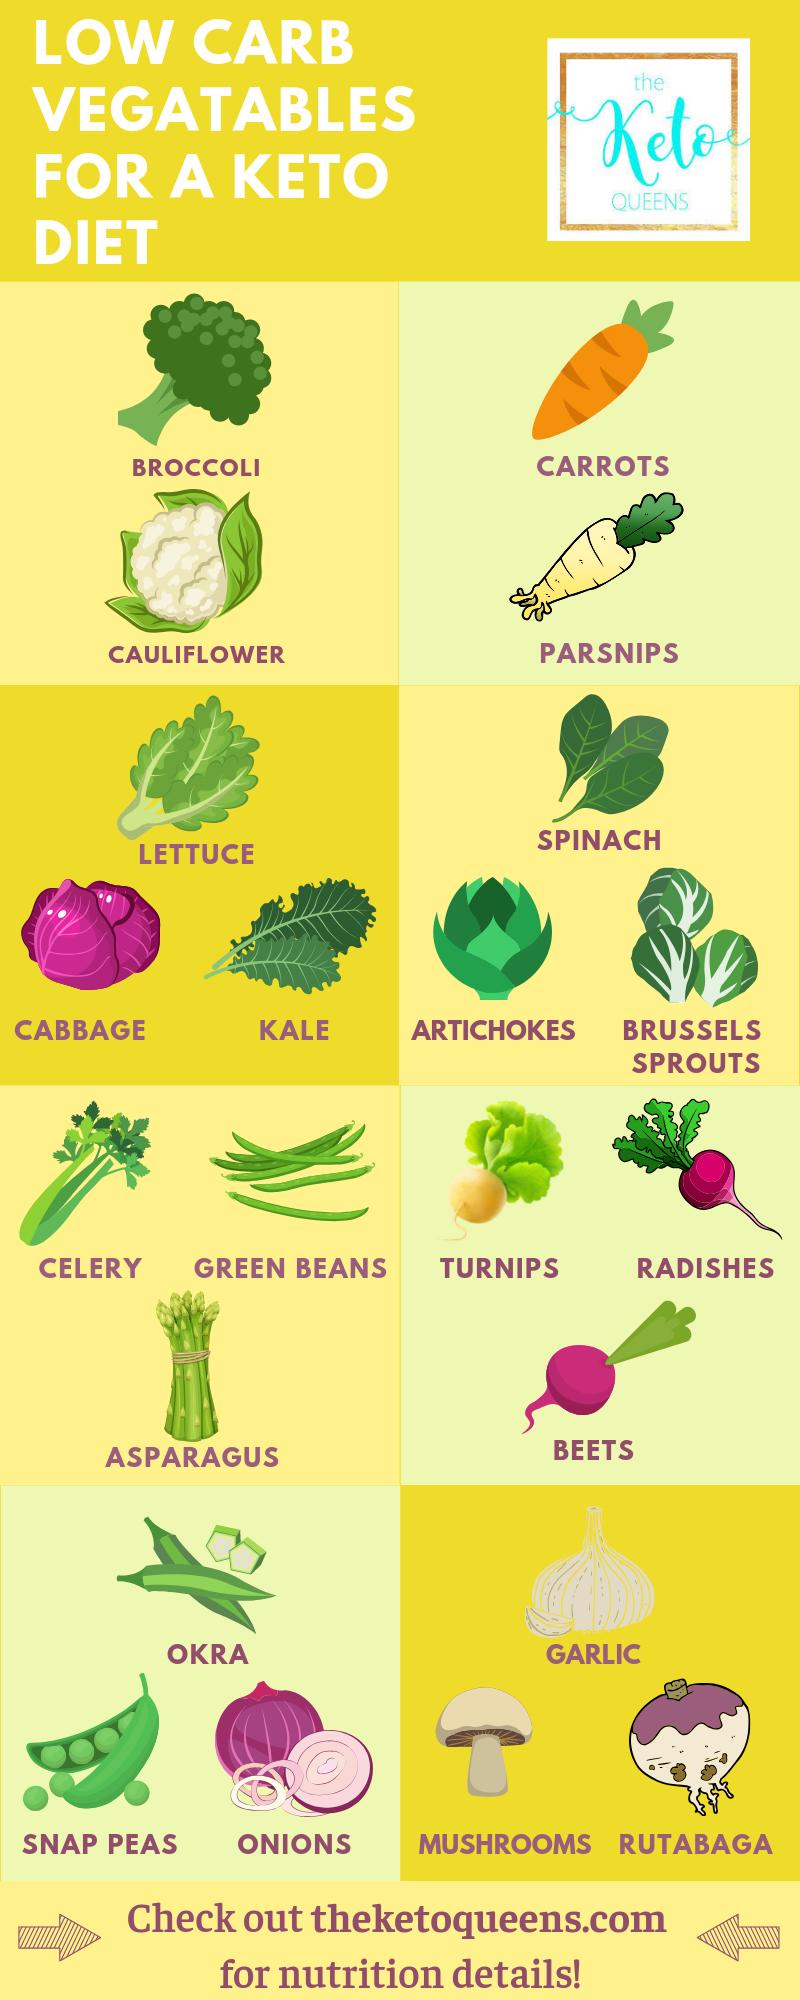 The Best Low Carb Vegetable Keto Vegetable List Low Carb Vegetables List Low Carb Vegetables List Of Vegetables